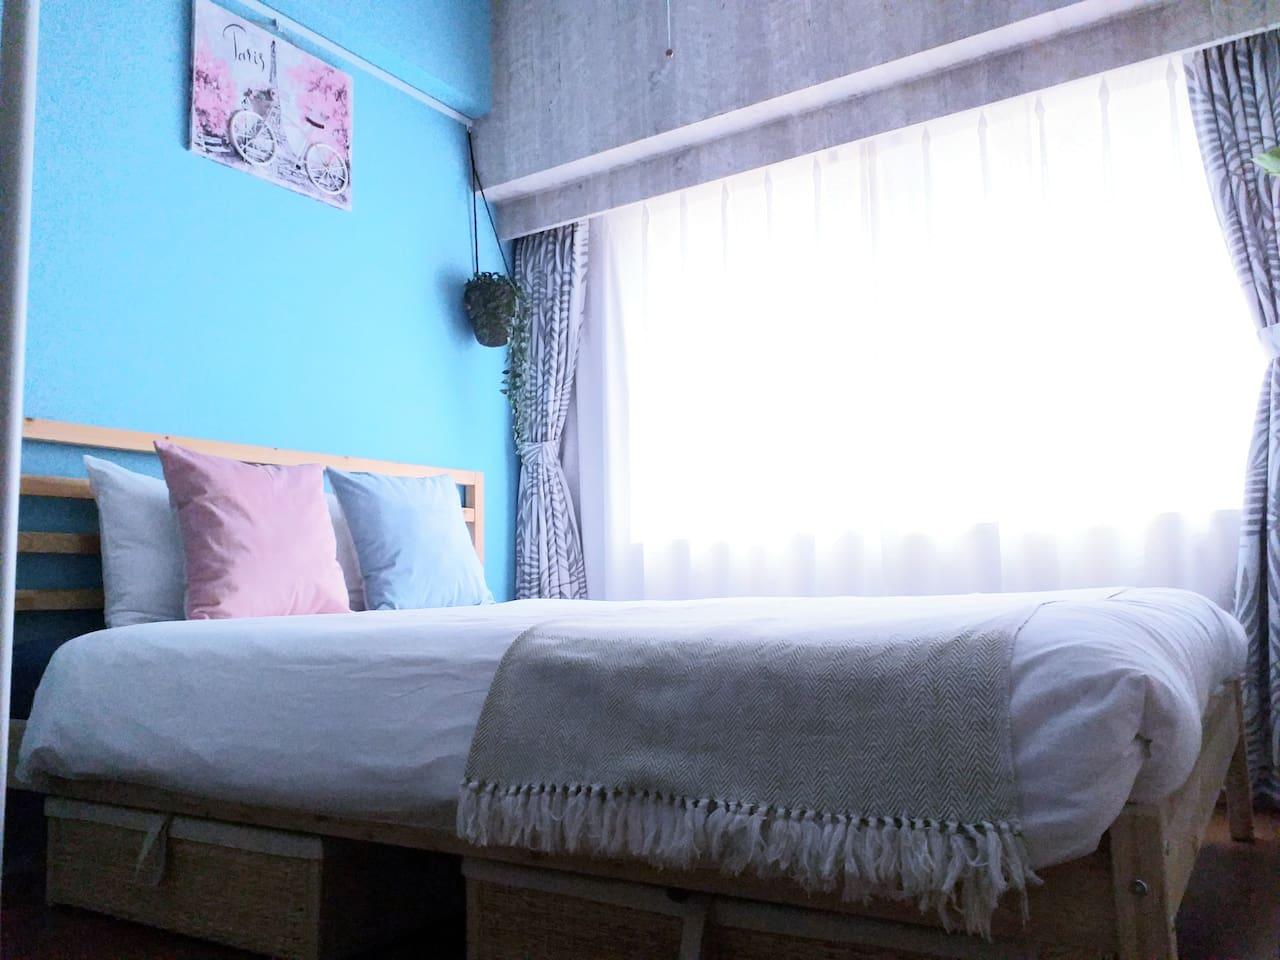 软硬适中的舒适床垫,标准双人床尺寸140cm*200cm Comfortable mattress with moderate hardness, standard double bed size 140cm * 200cm